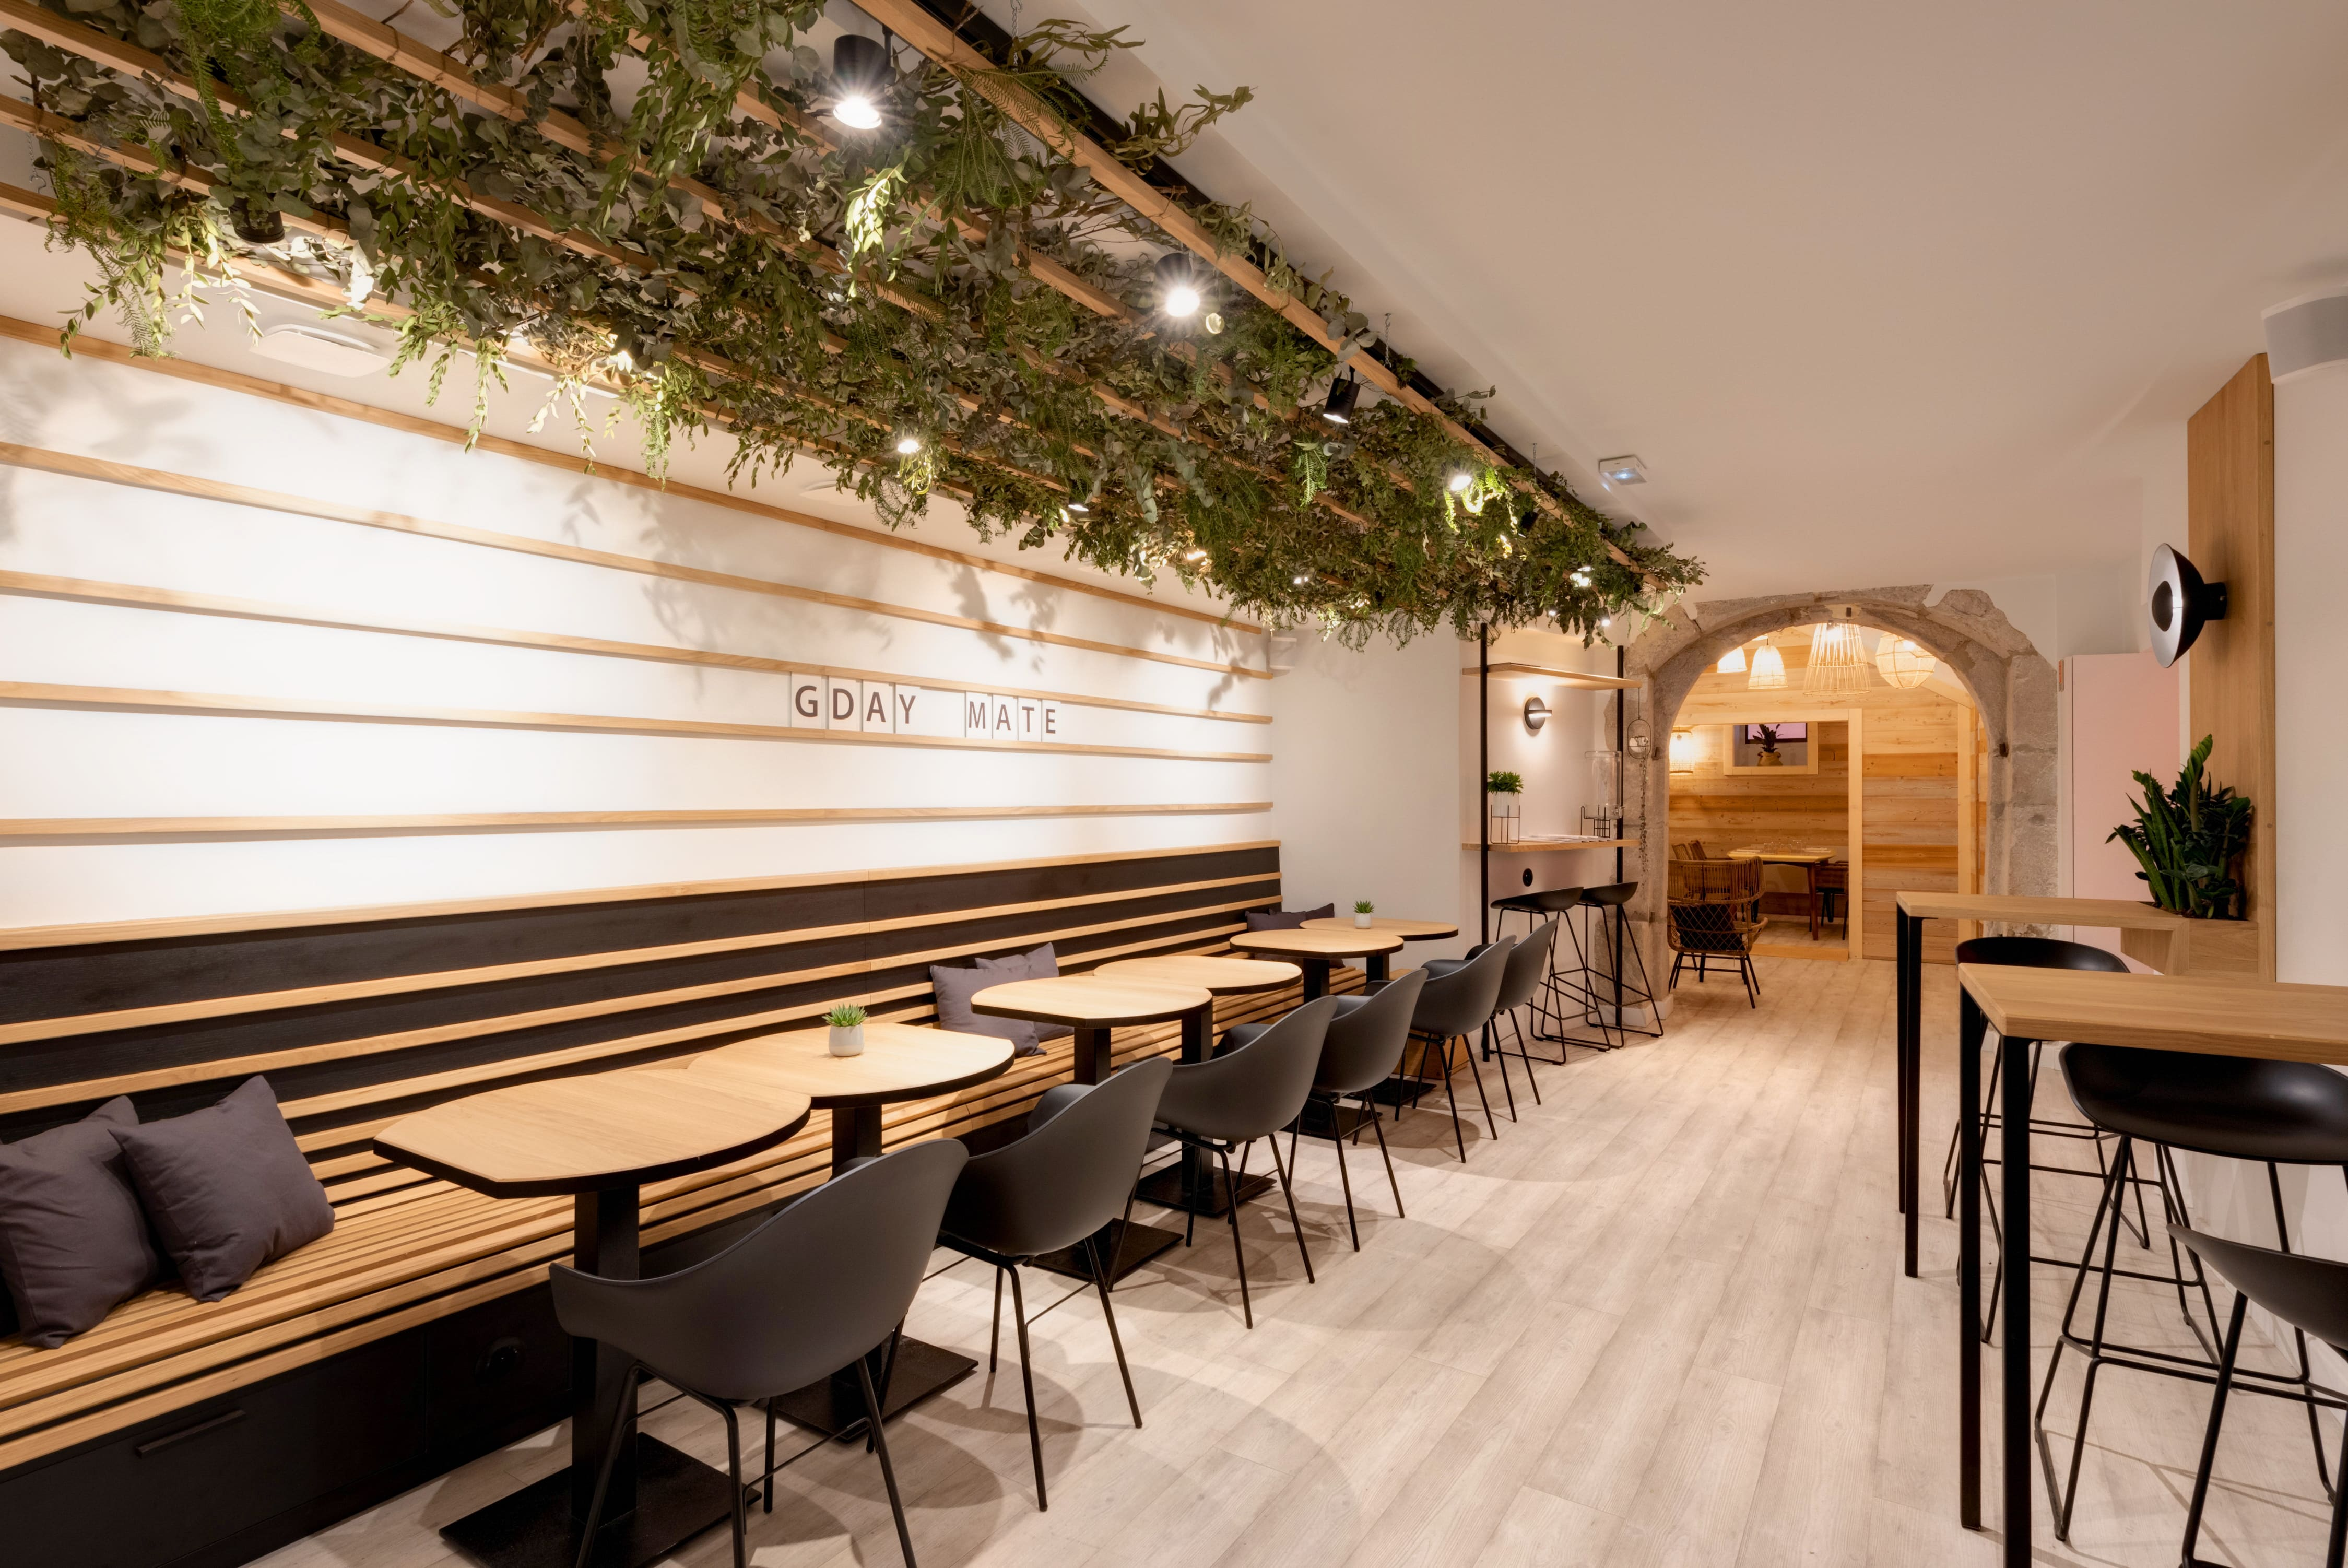 Agencement interieur design métallique ROBI restaurant Haven Annecy 74 agencement en metal